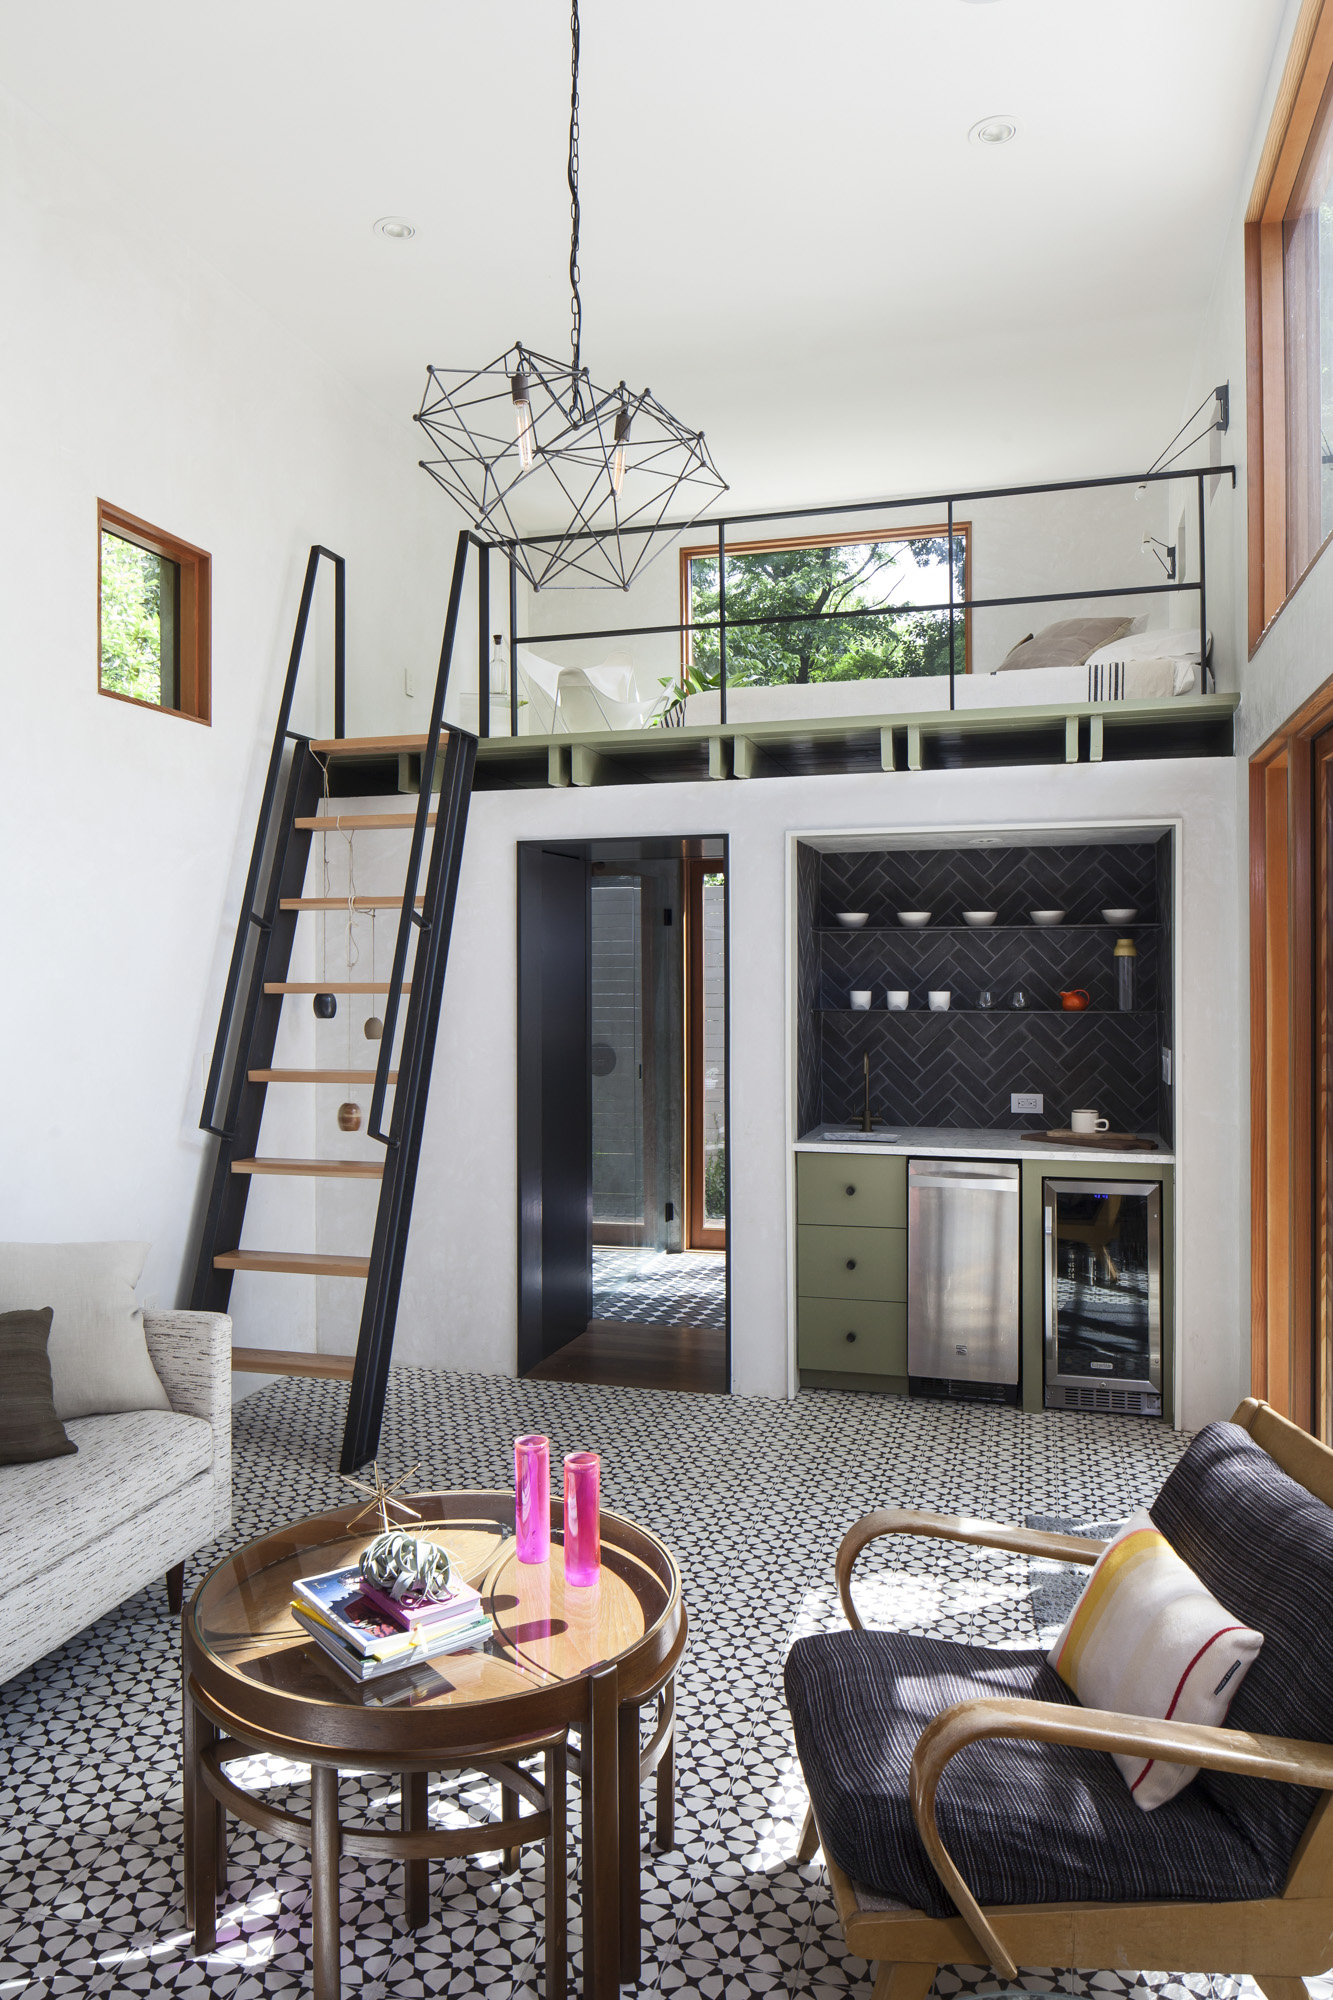 Elizabeth-Baird-Architecture-Garner Pool and Casita- casita living room and loft.jpg